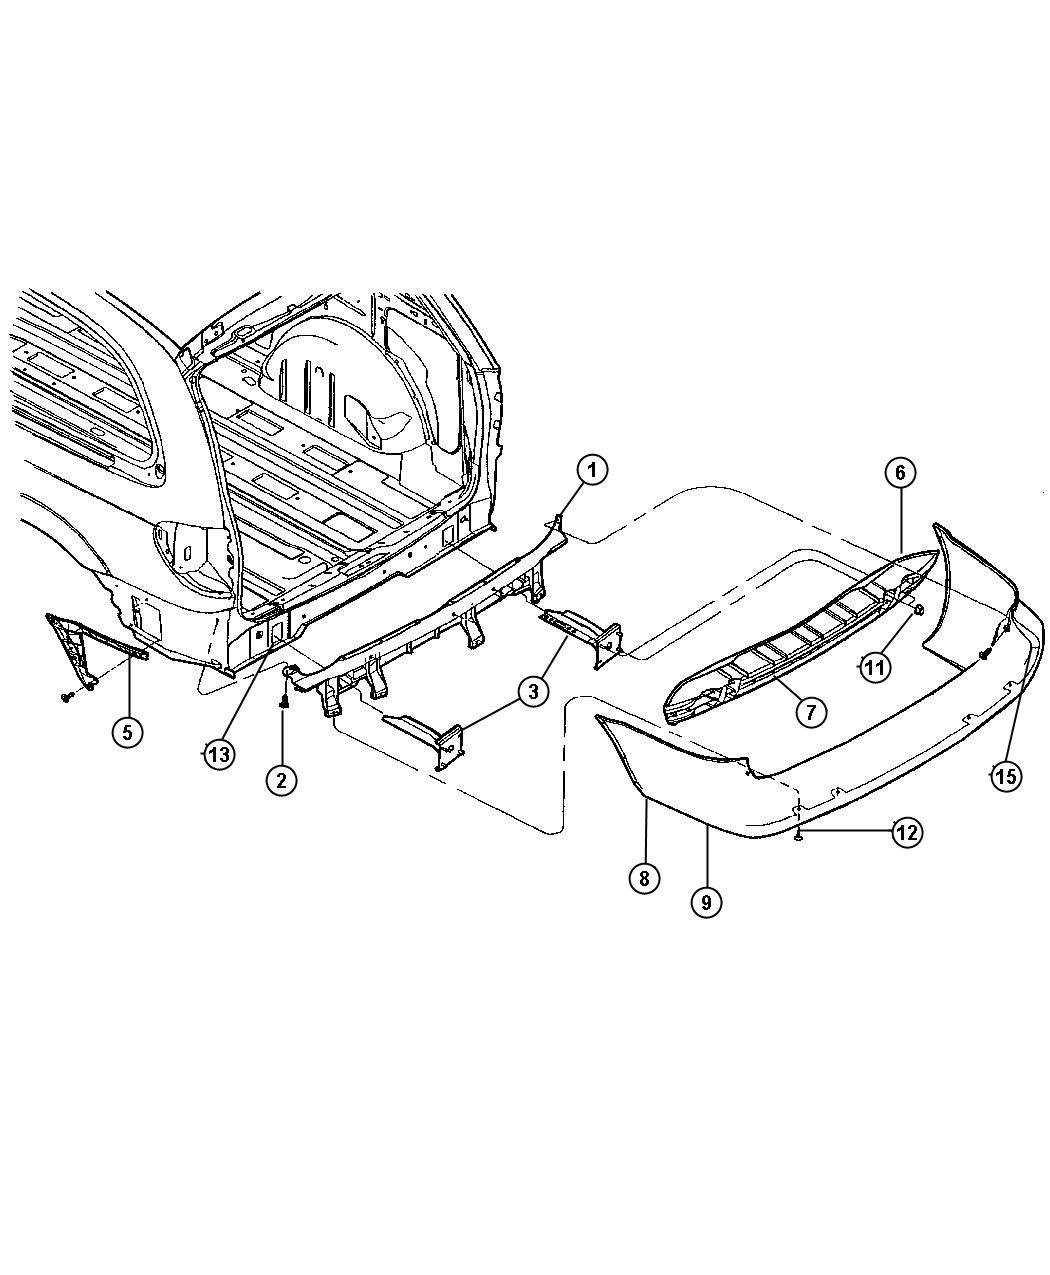 2007 dodge grand caravan fascia  rear  primed  body